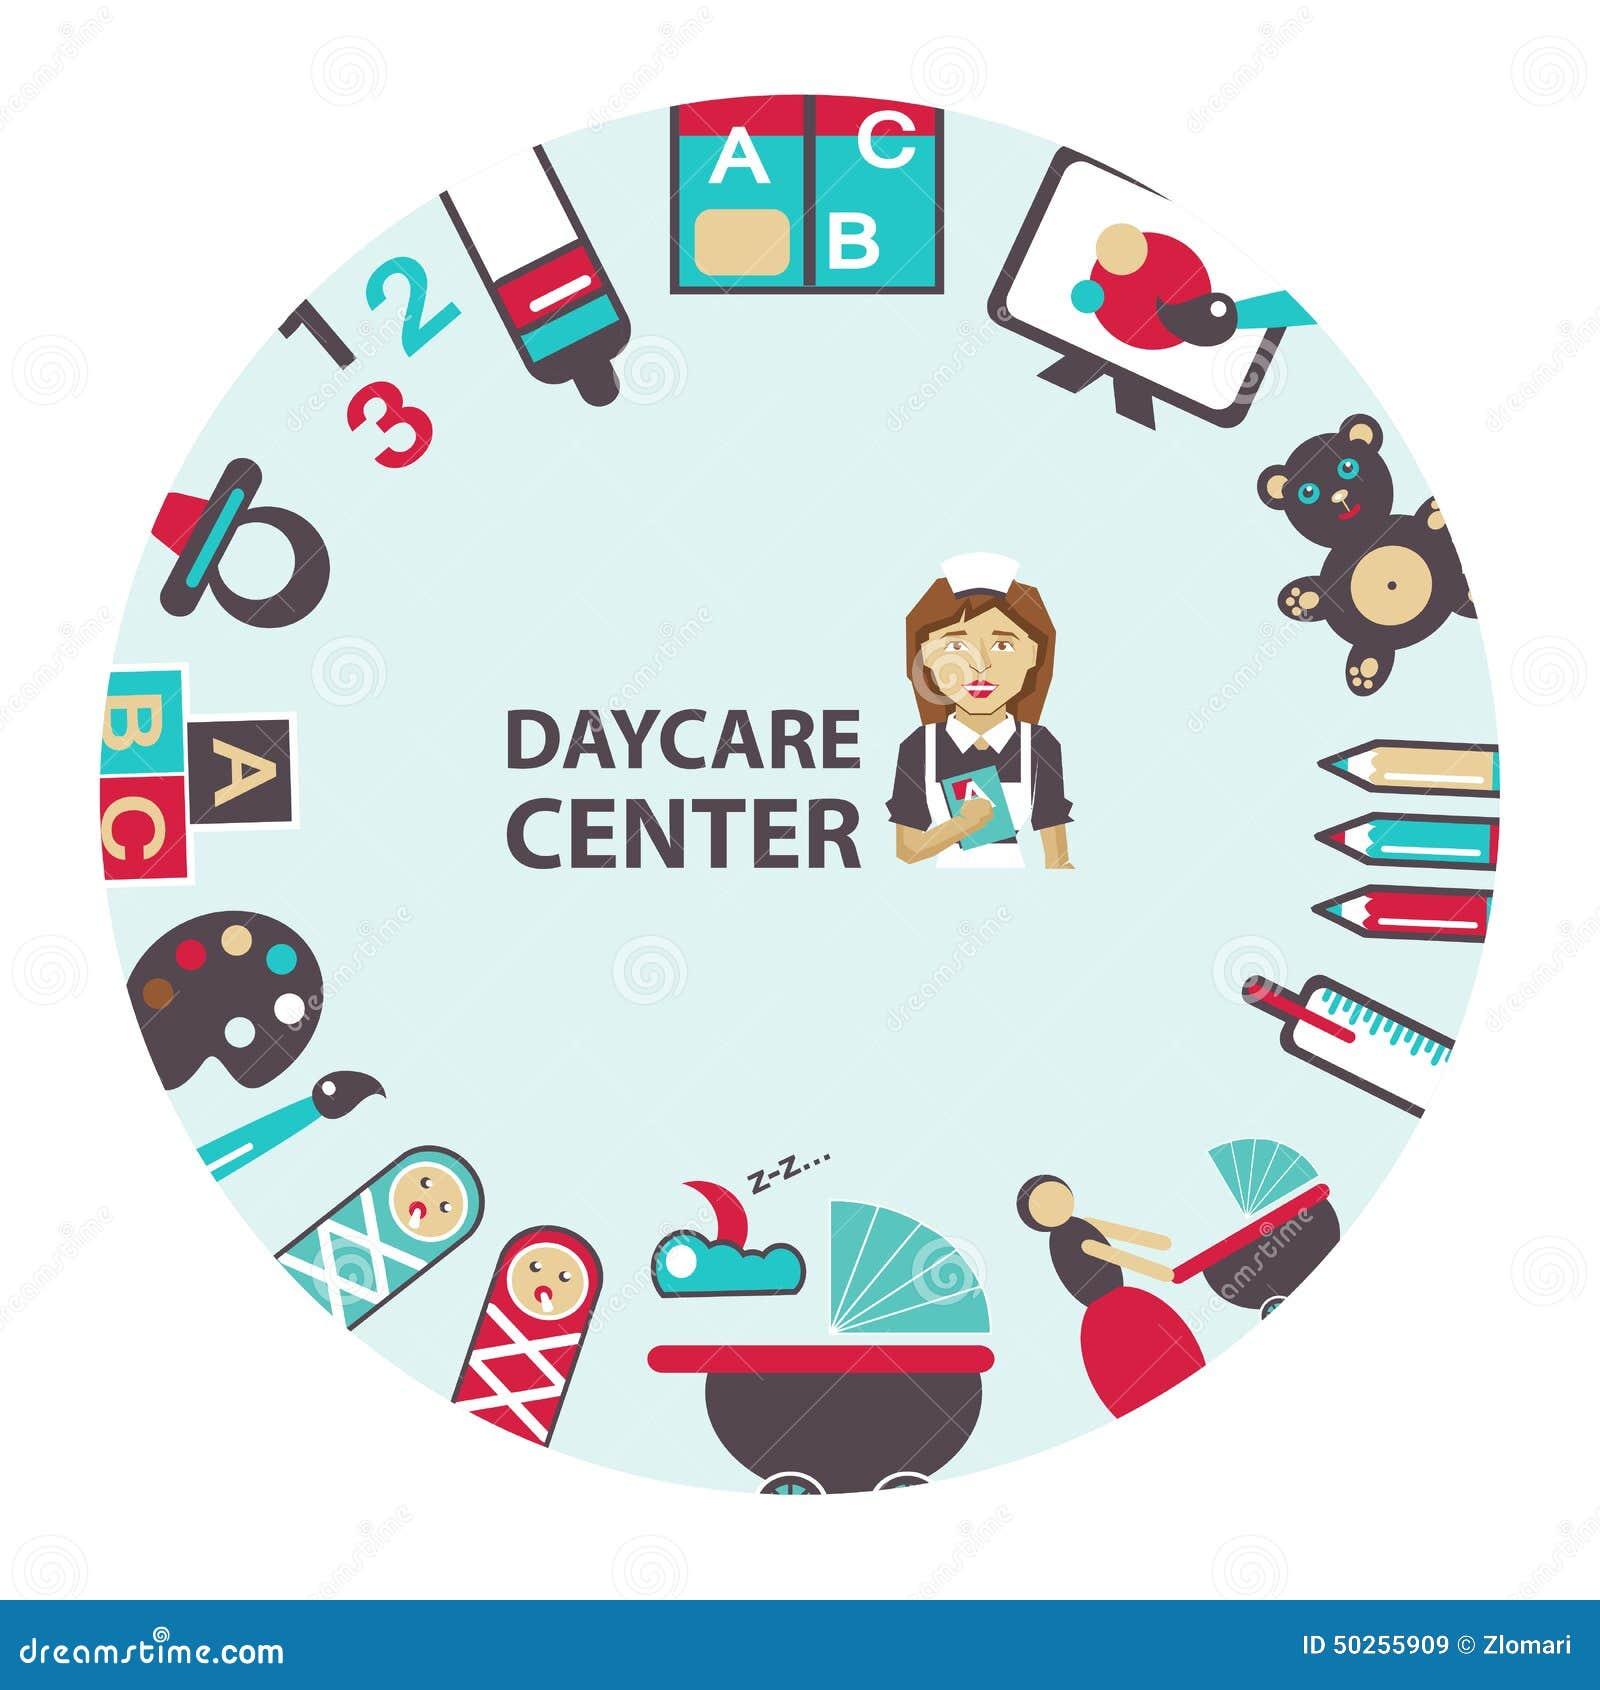 Daycare Center Emblem Stock Vector - Image: 50255909